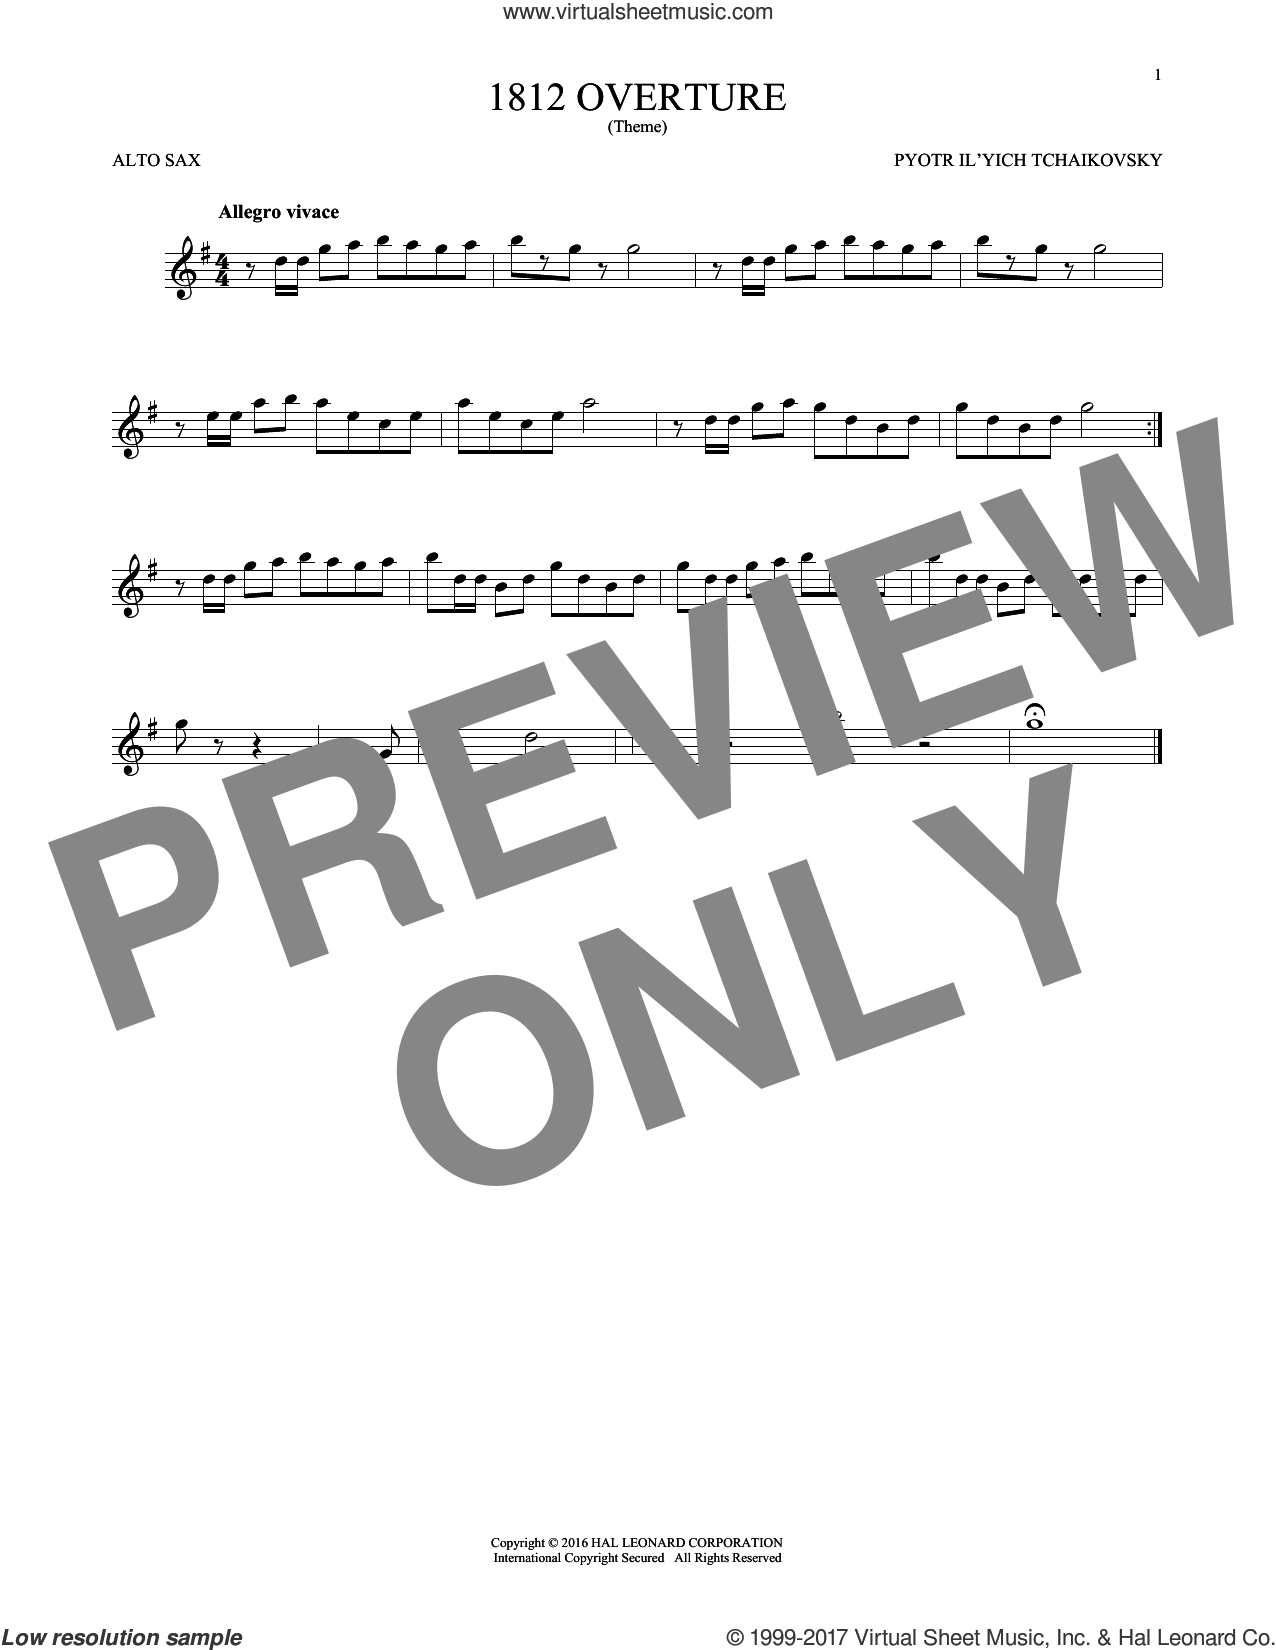 1812 Overture sheet music for alto saxophone solo by Pyotr Ilyich Tchaikovsky, classical score, intermediate skill level